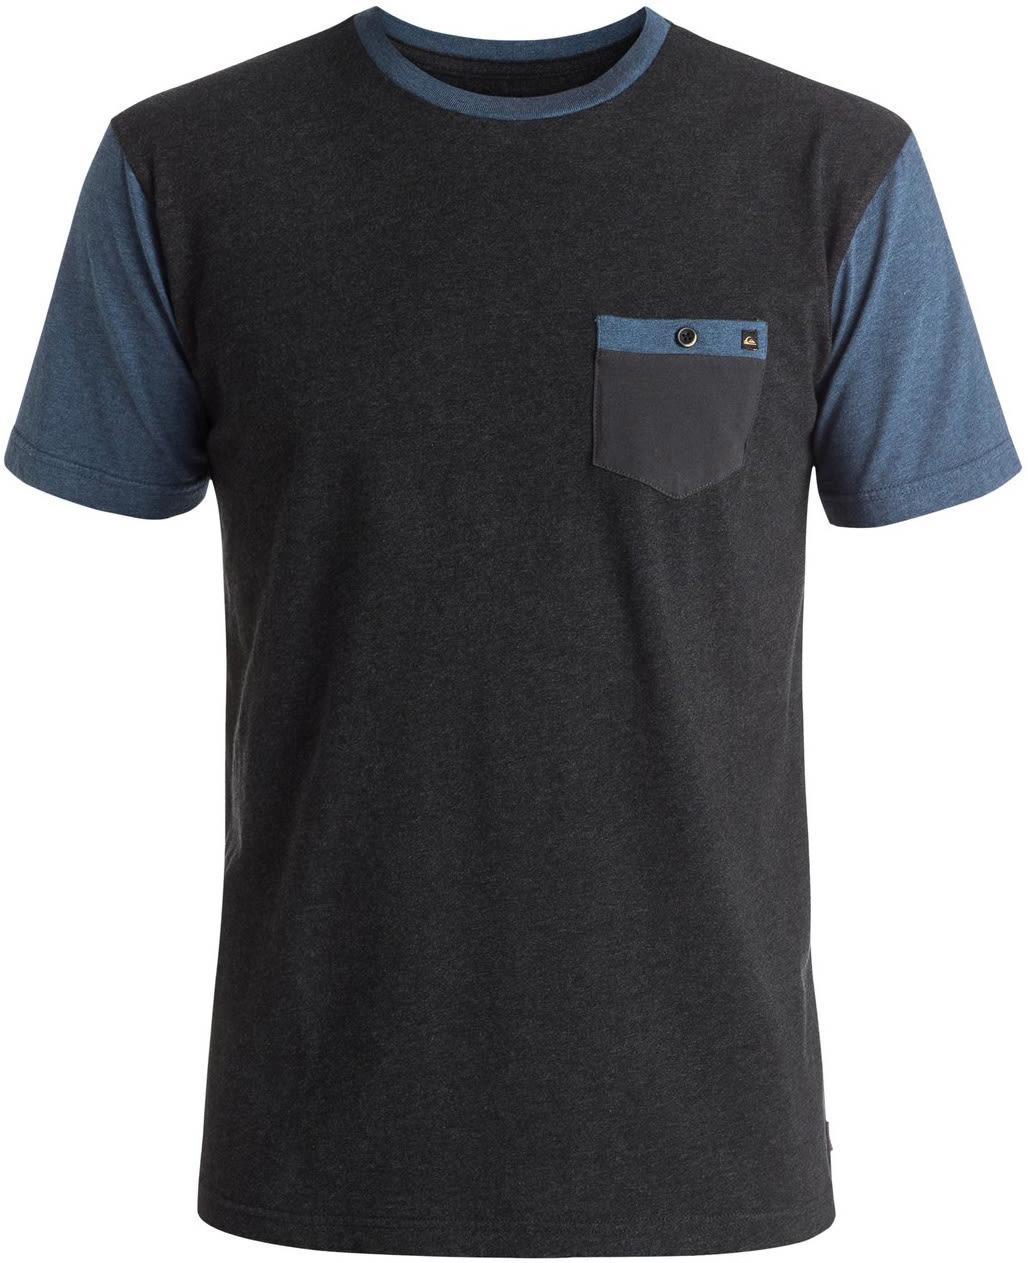 Quiksilver Baysic Pocket T-Shirt qs3bayp04nbh15zz-quiksilver-t-shirts